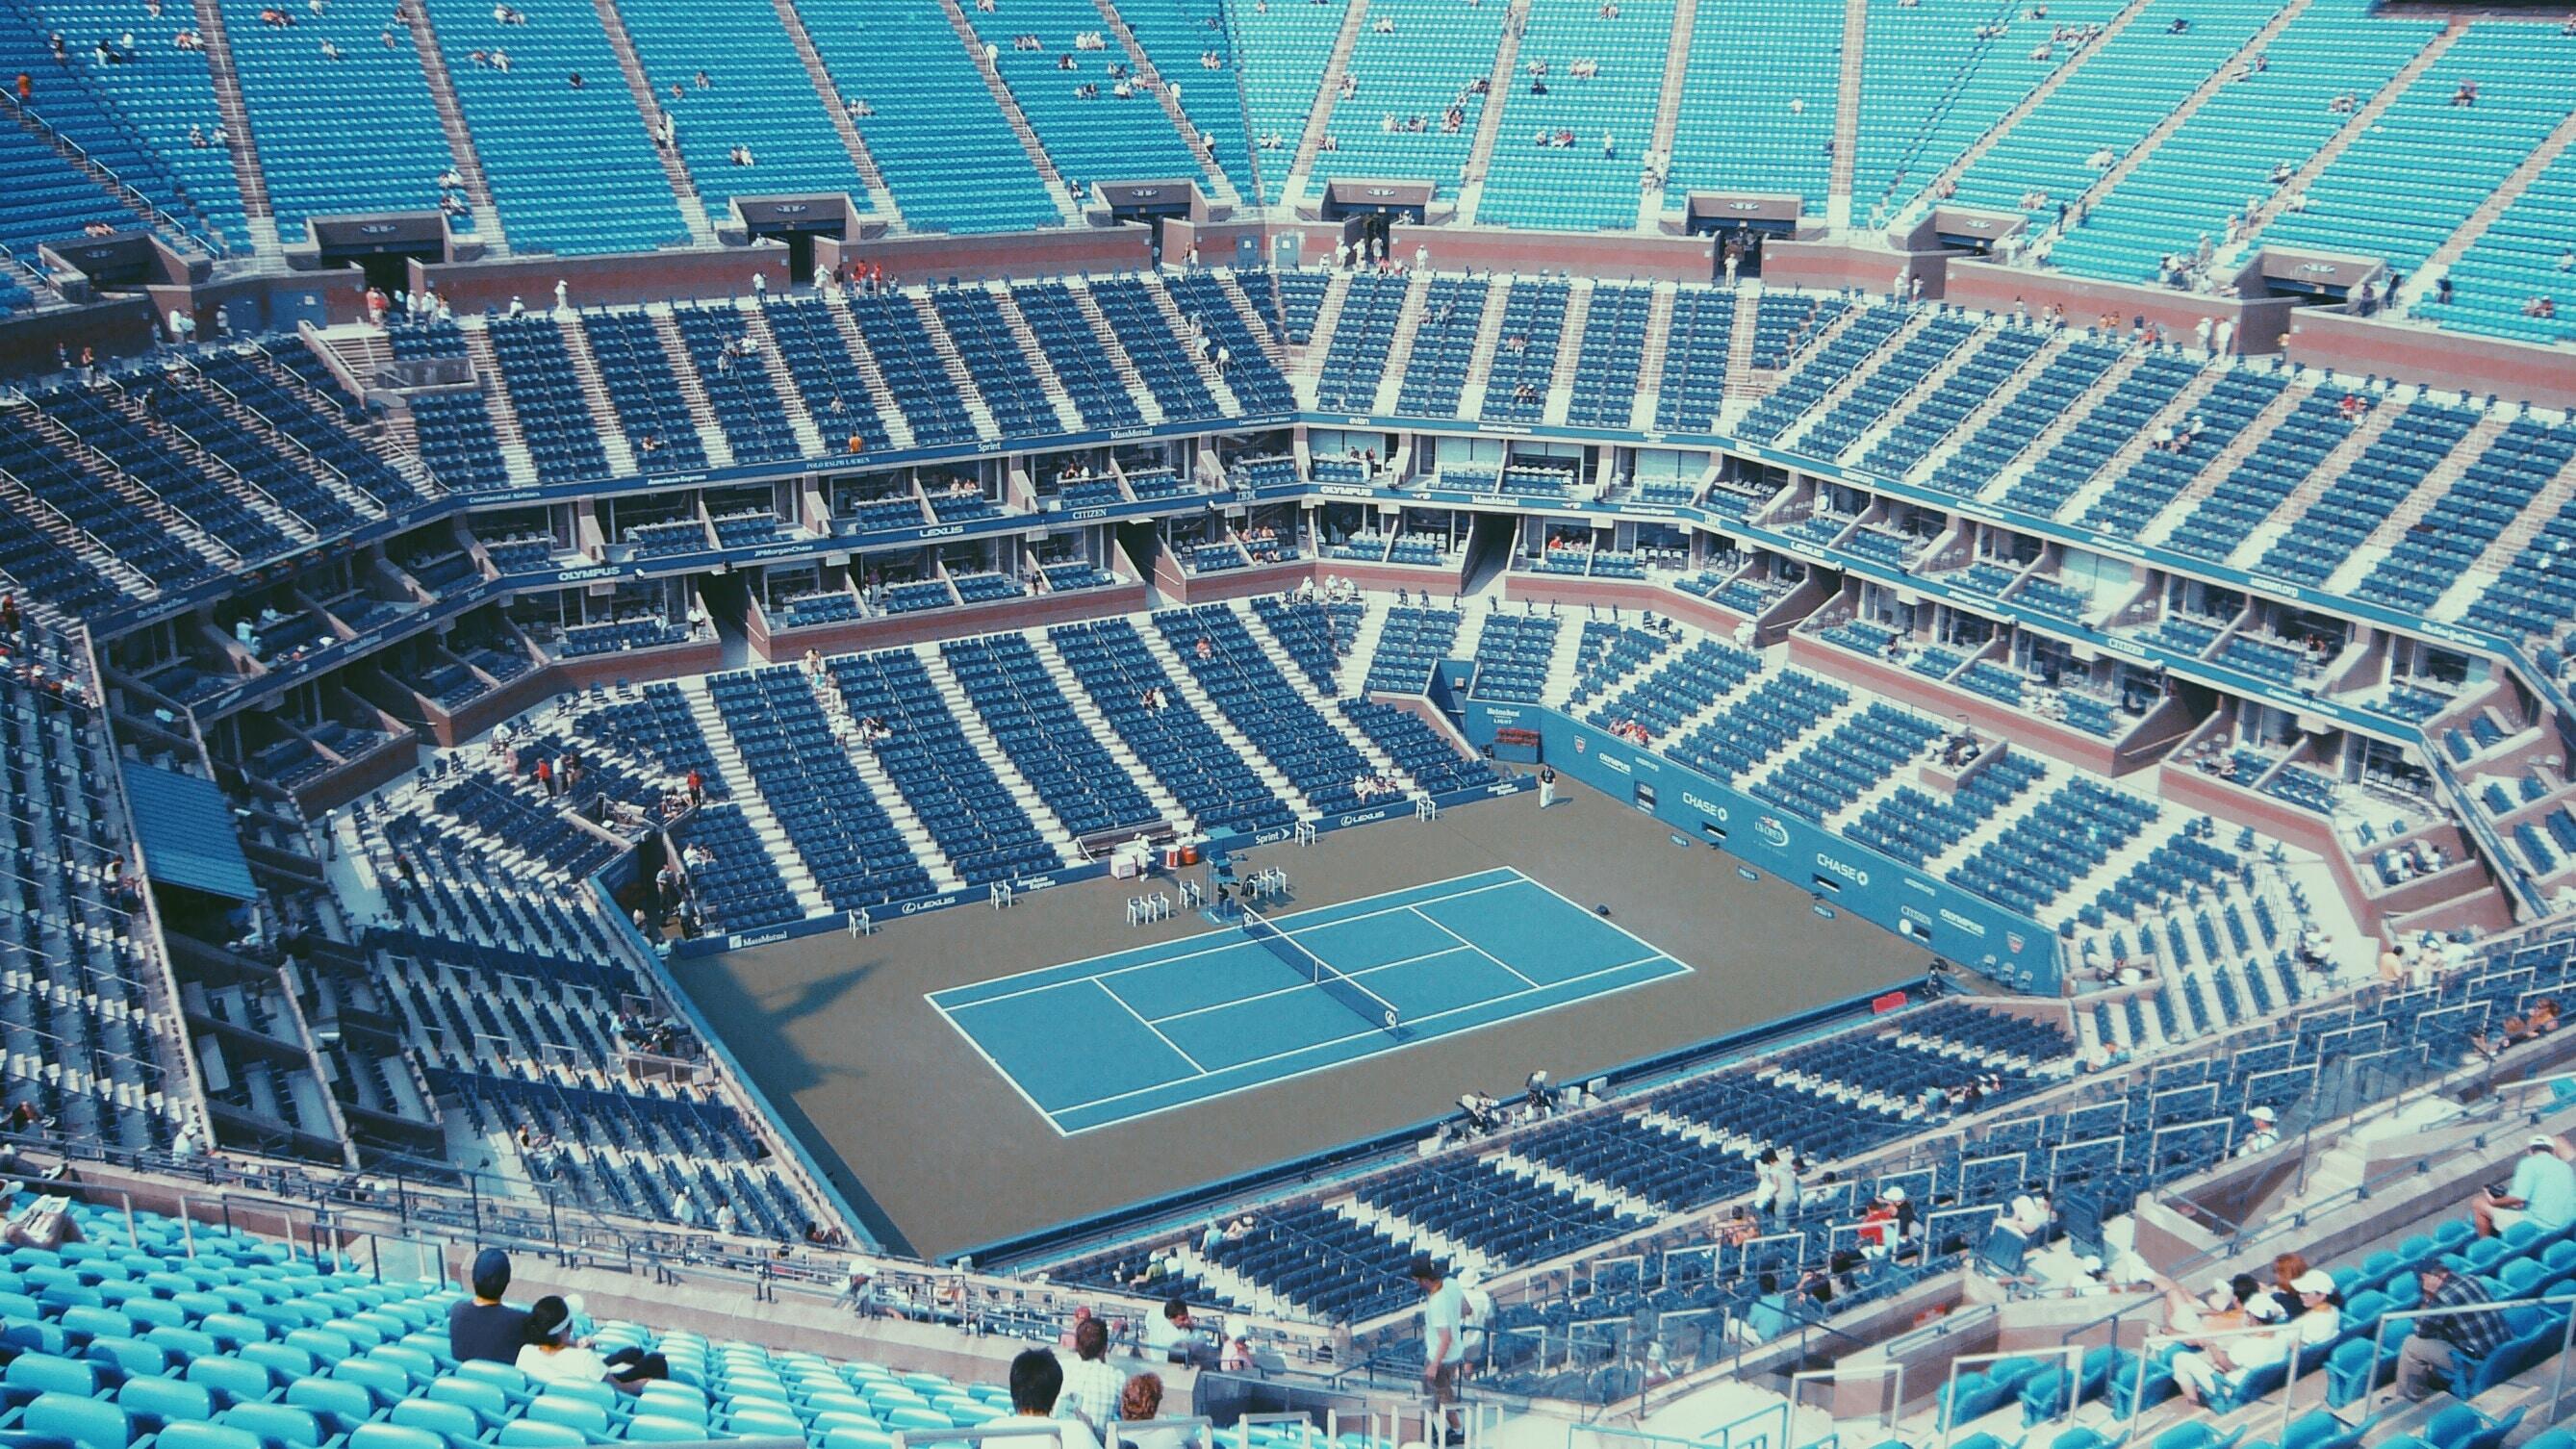 blue and white tennis stadium